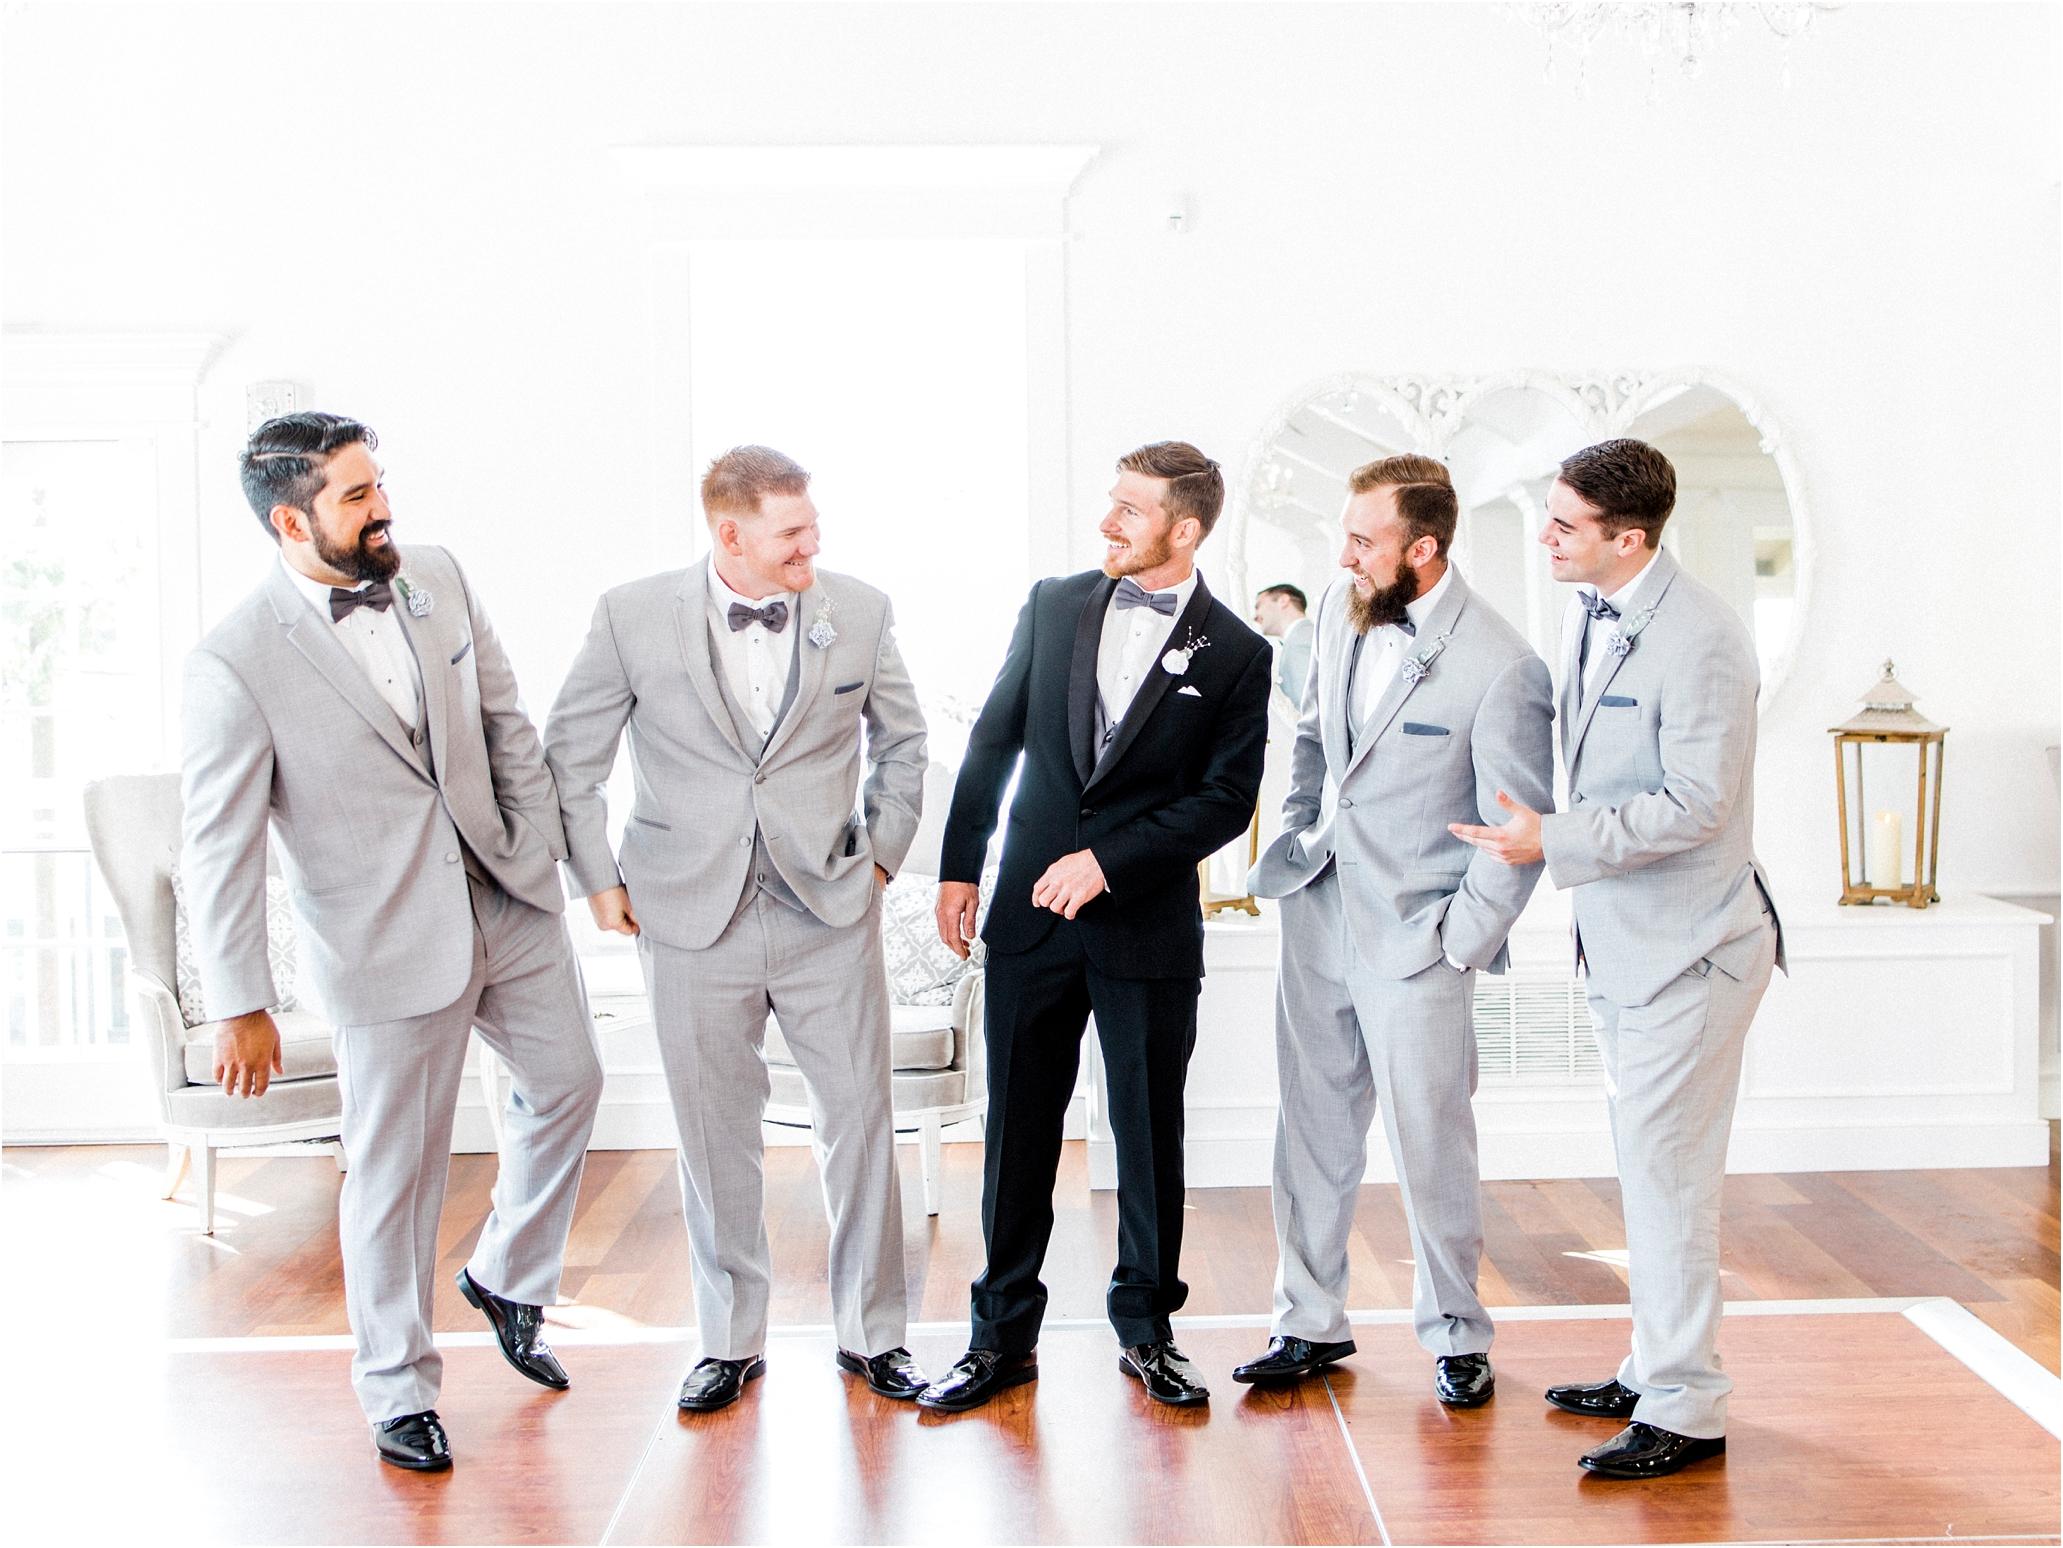 Lisa Silva Photography- Ponte Vedra Beach and Jacksonville, Florida Fine Art Film Wedding Photography- Wedding at The White Room Villa Blanca in St. Augustine, Florida_0030.jpg